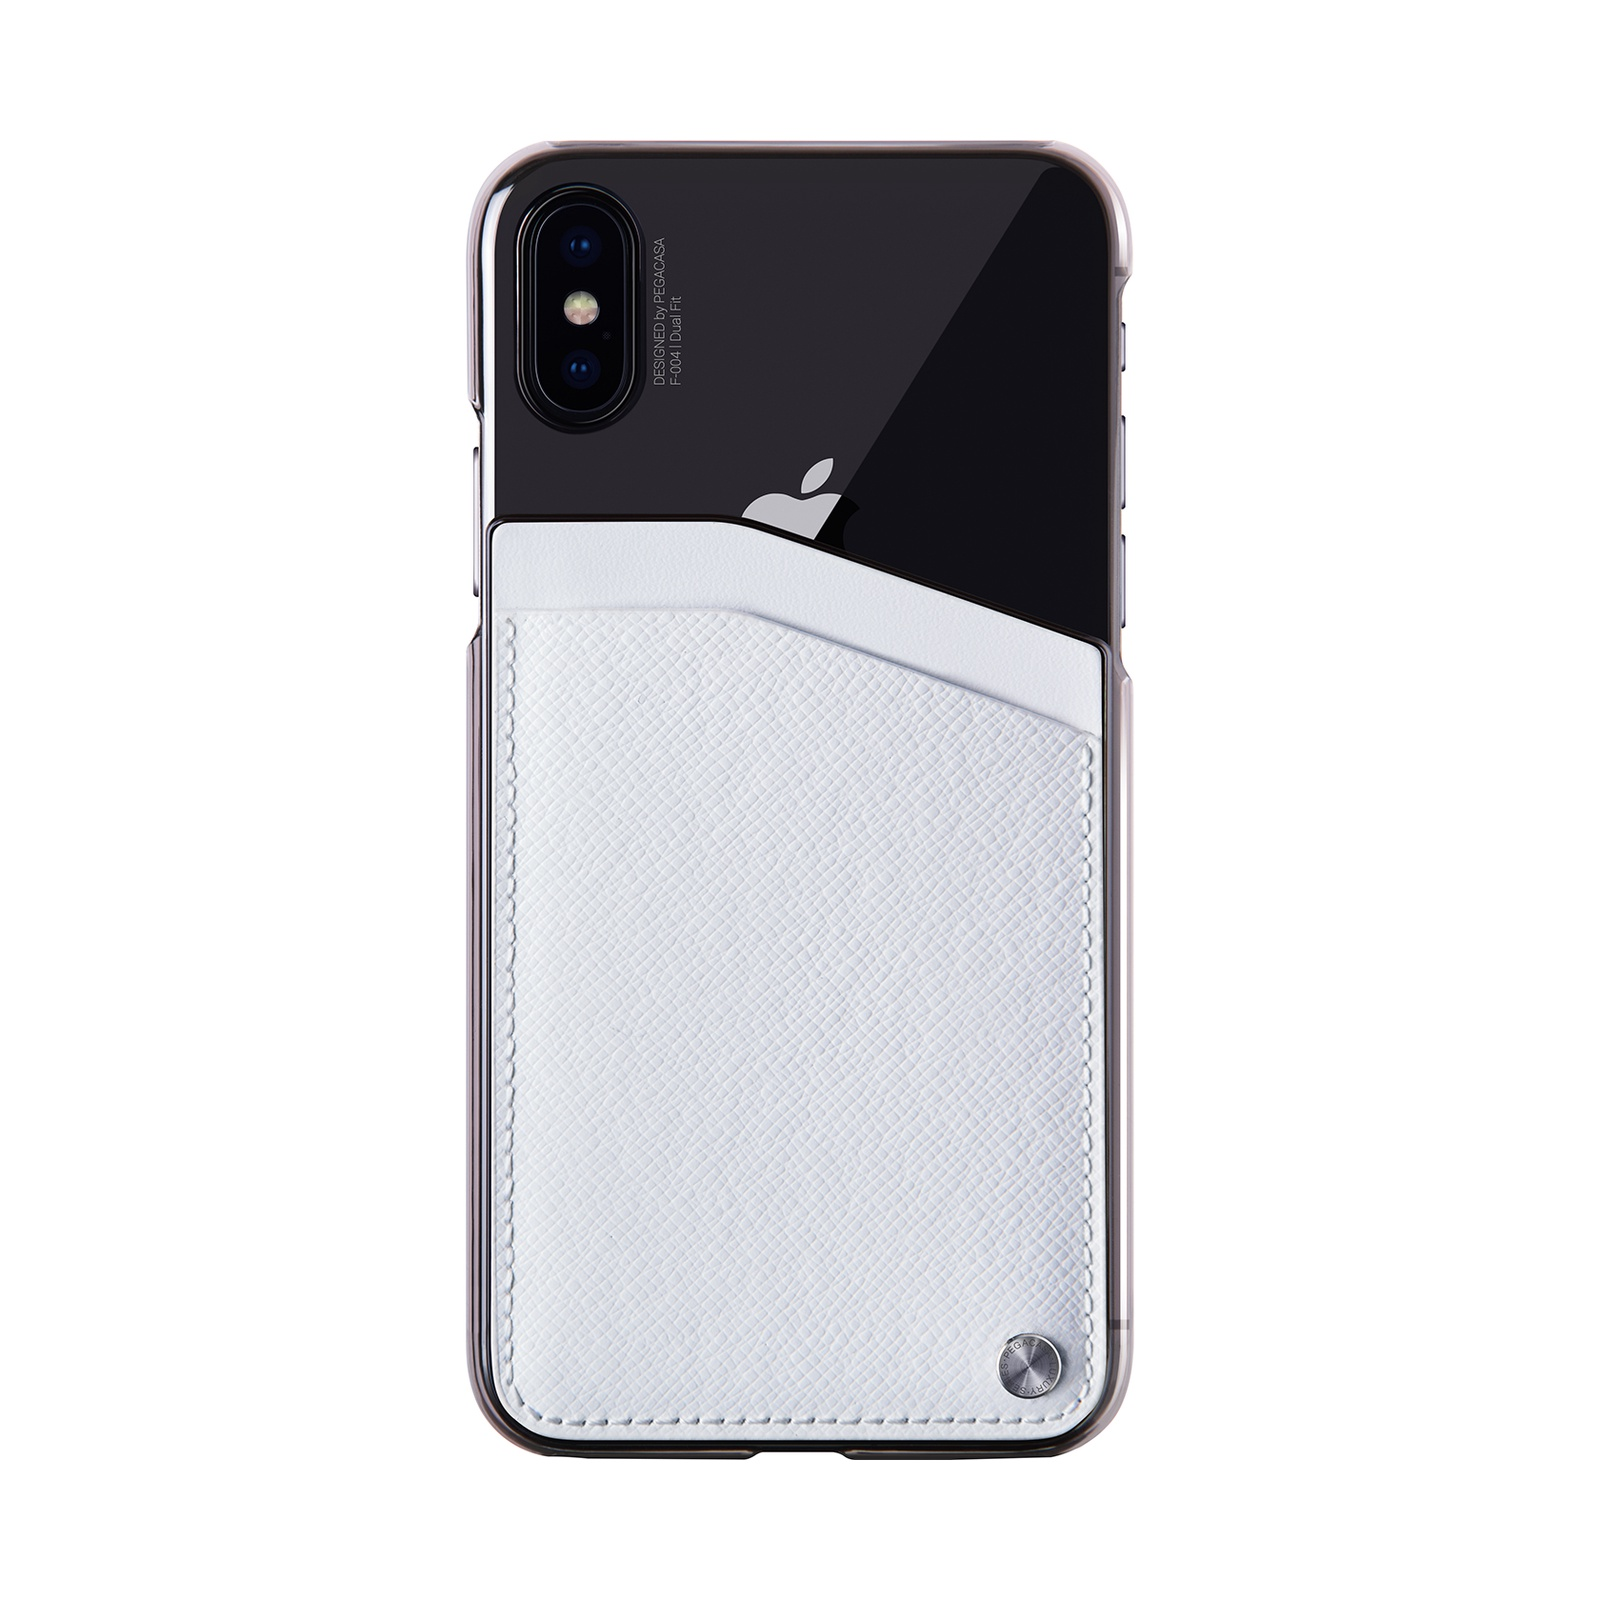 Чехол для сотового телефона PEGACASA F-004 Dual Fit для iPhone XS/X, белый цена и фото